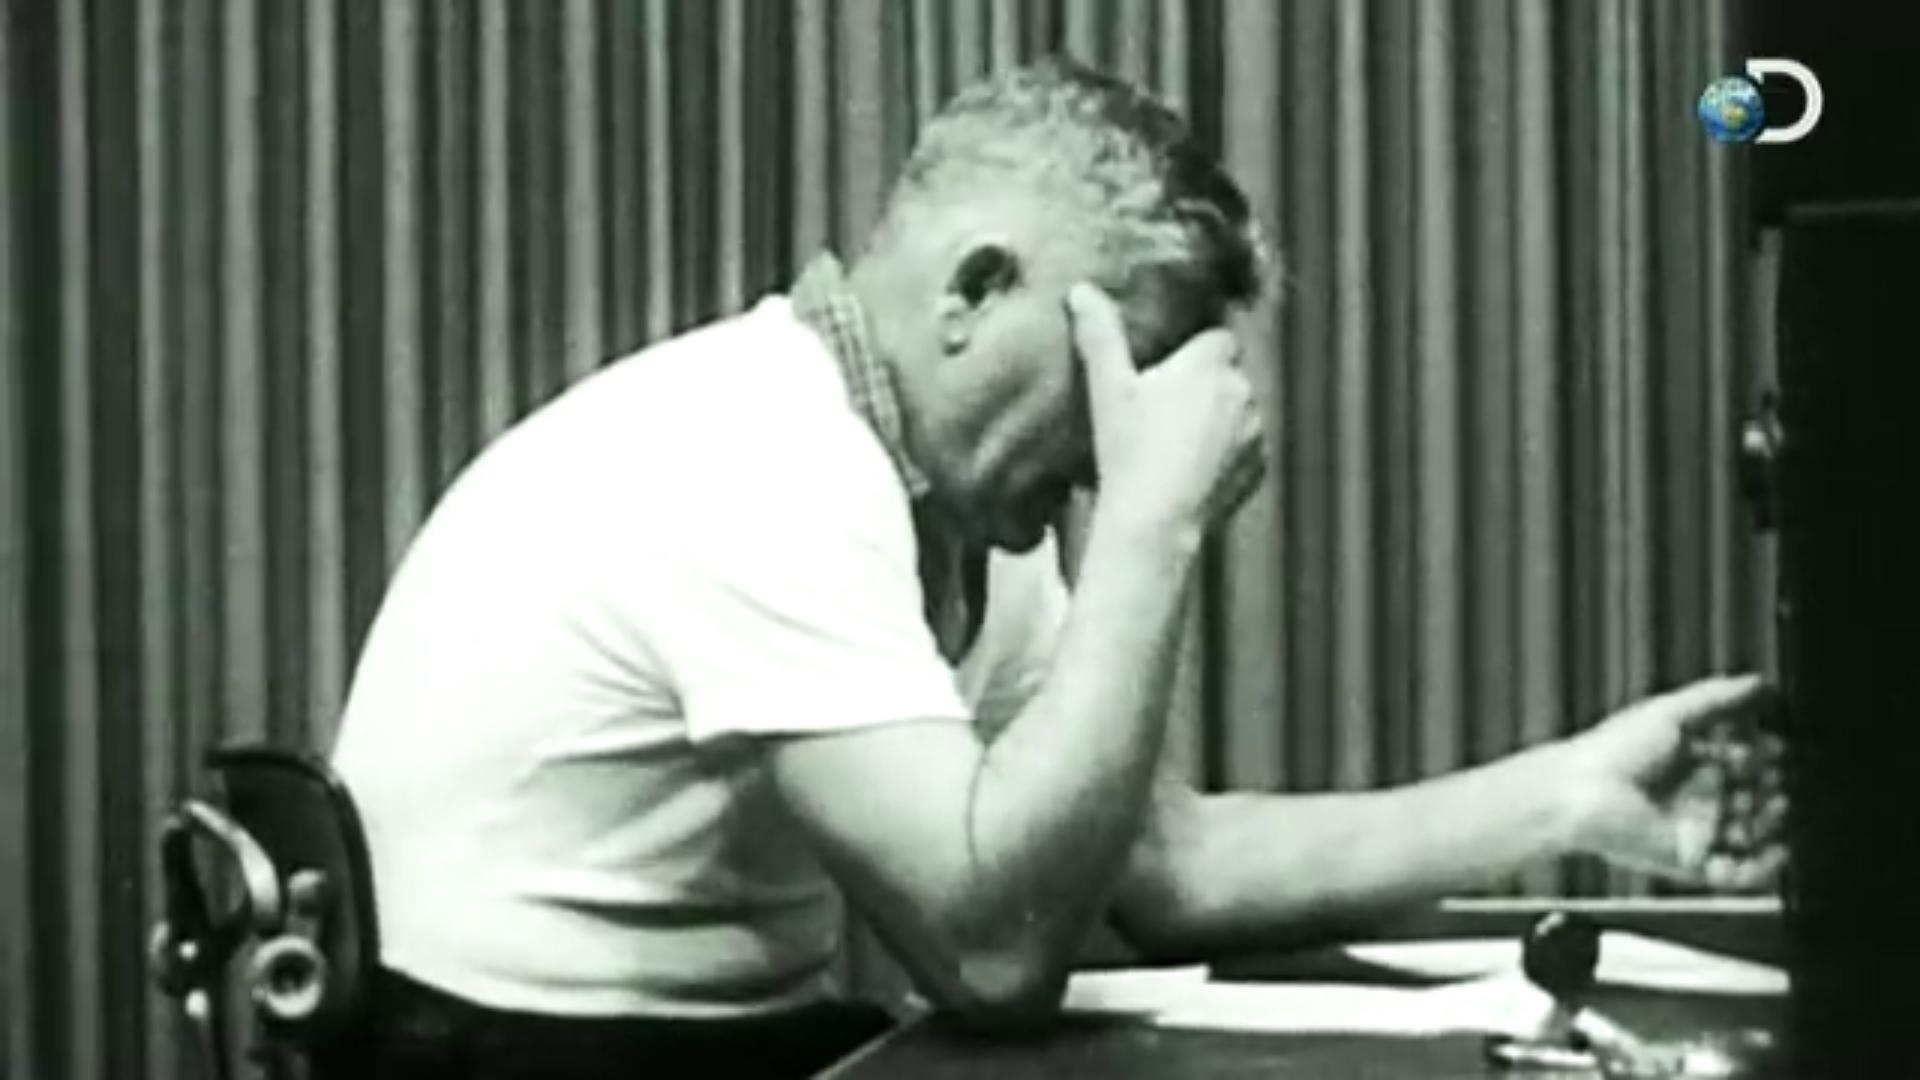 Curiosity: How Evil Are You?   The Milgram Experiment Discovery有重新製作實驗的片段,可以從這三分鐘體驗按下開關的手有多沉重。